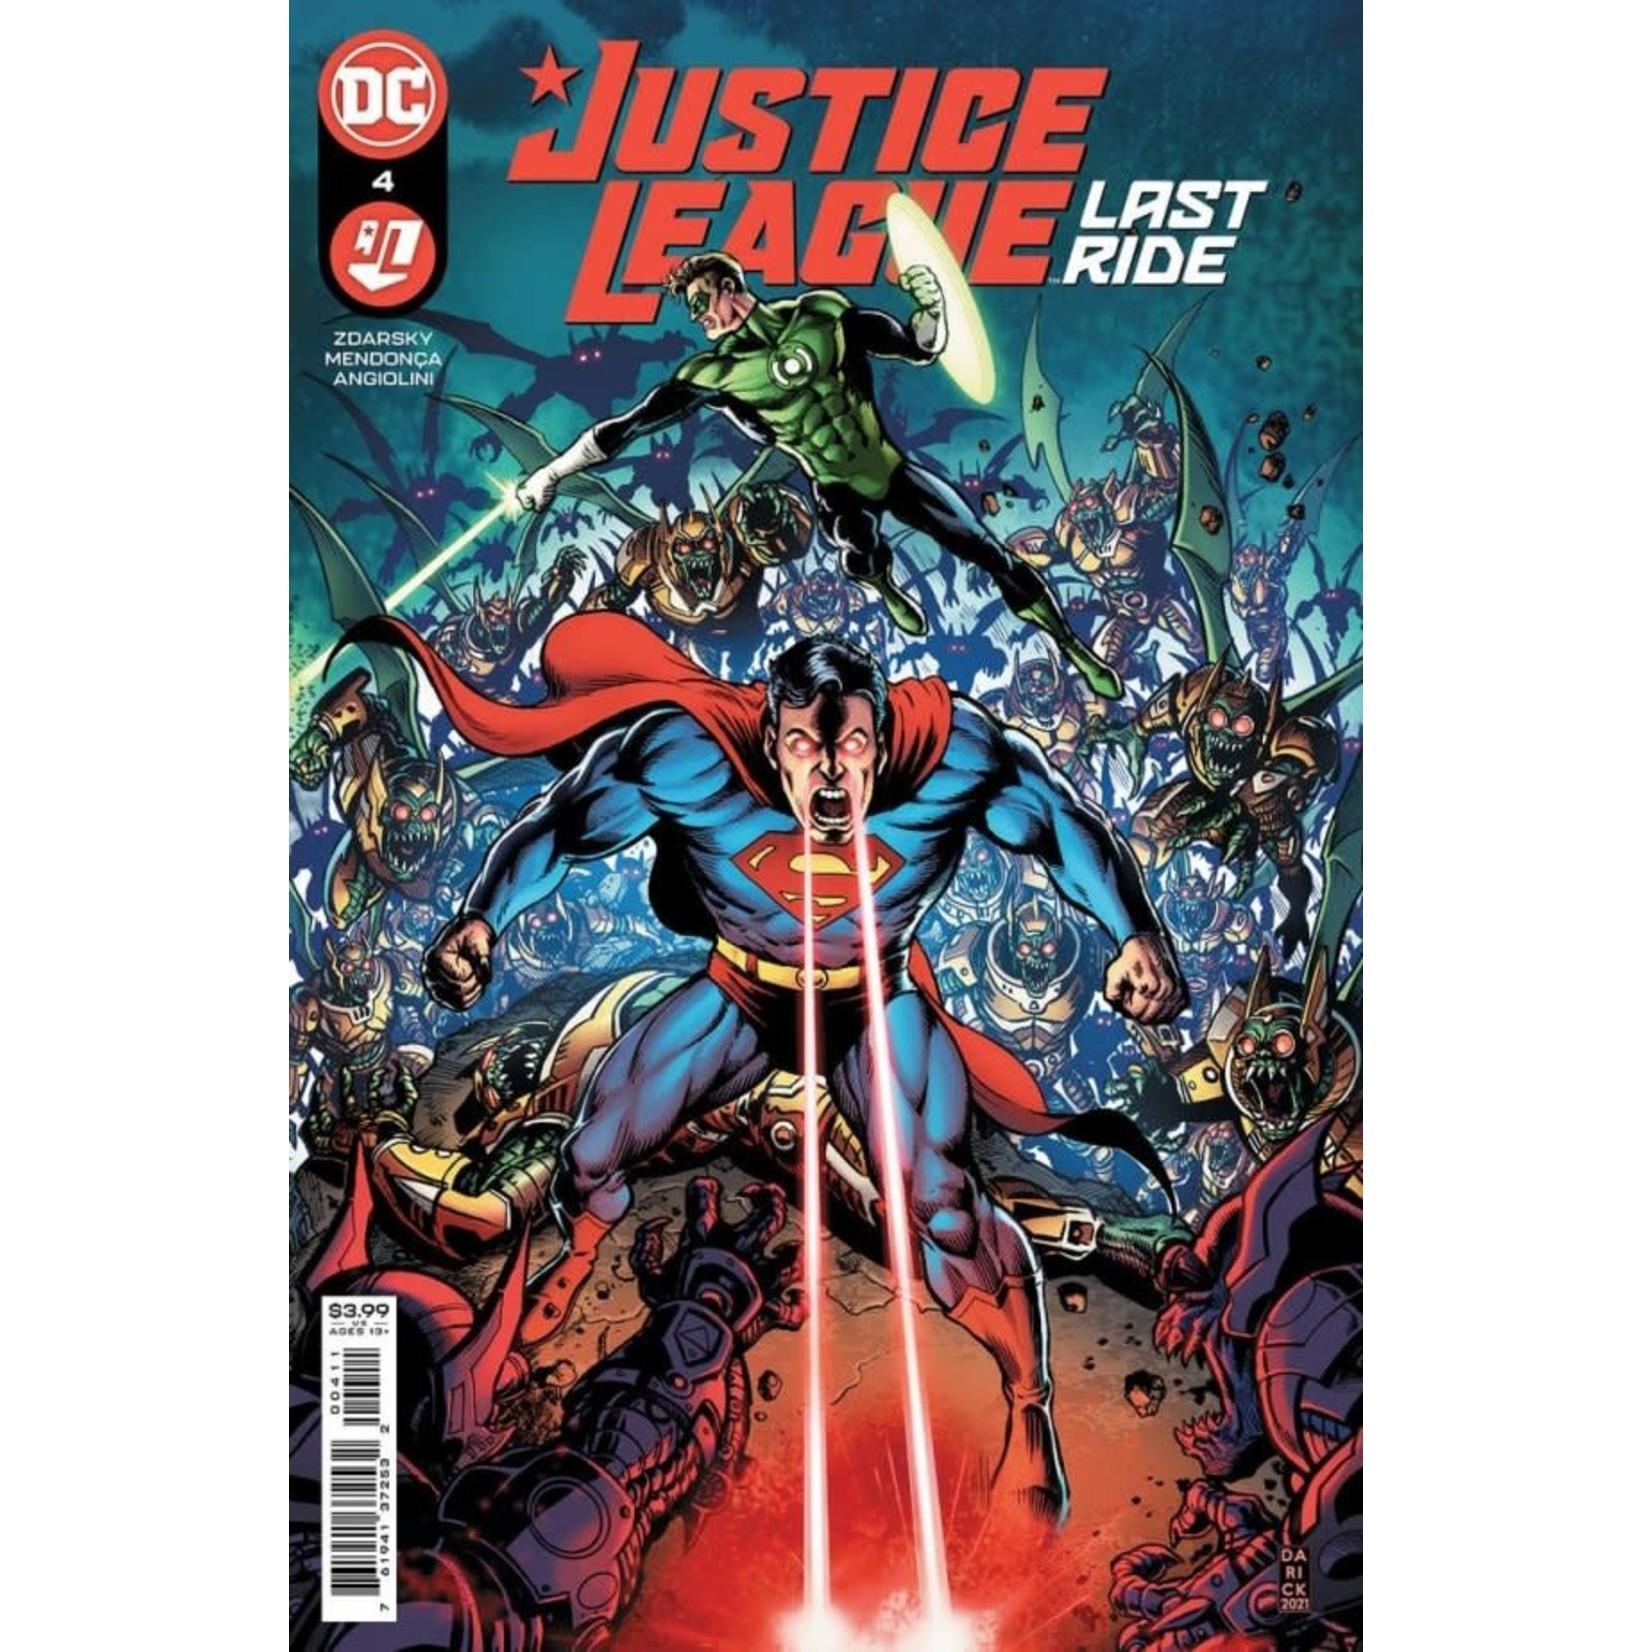 DC Comics Justice League Last ride #4 Cover A